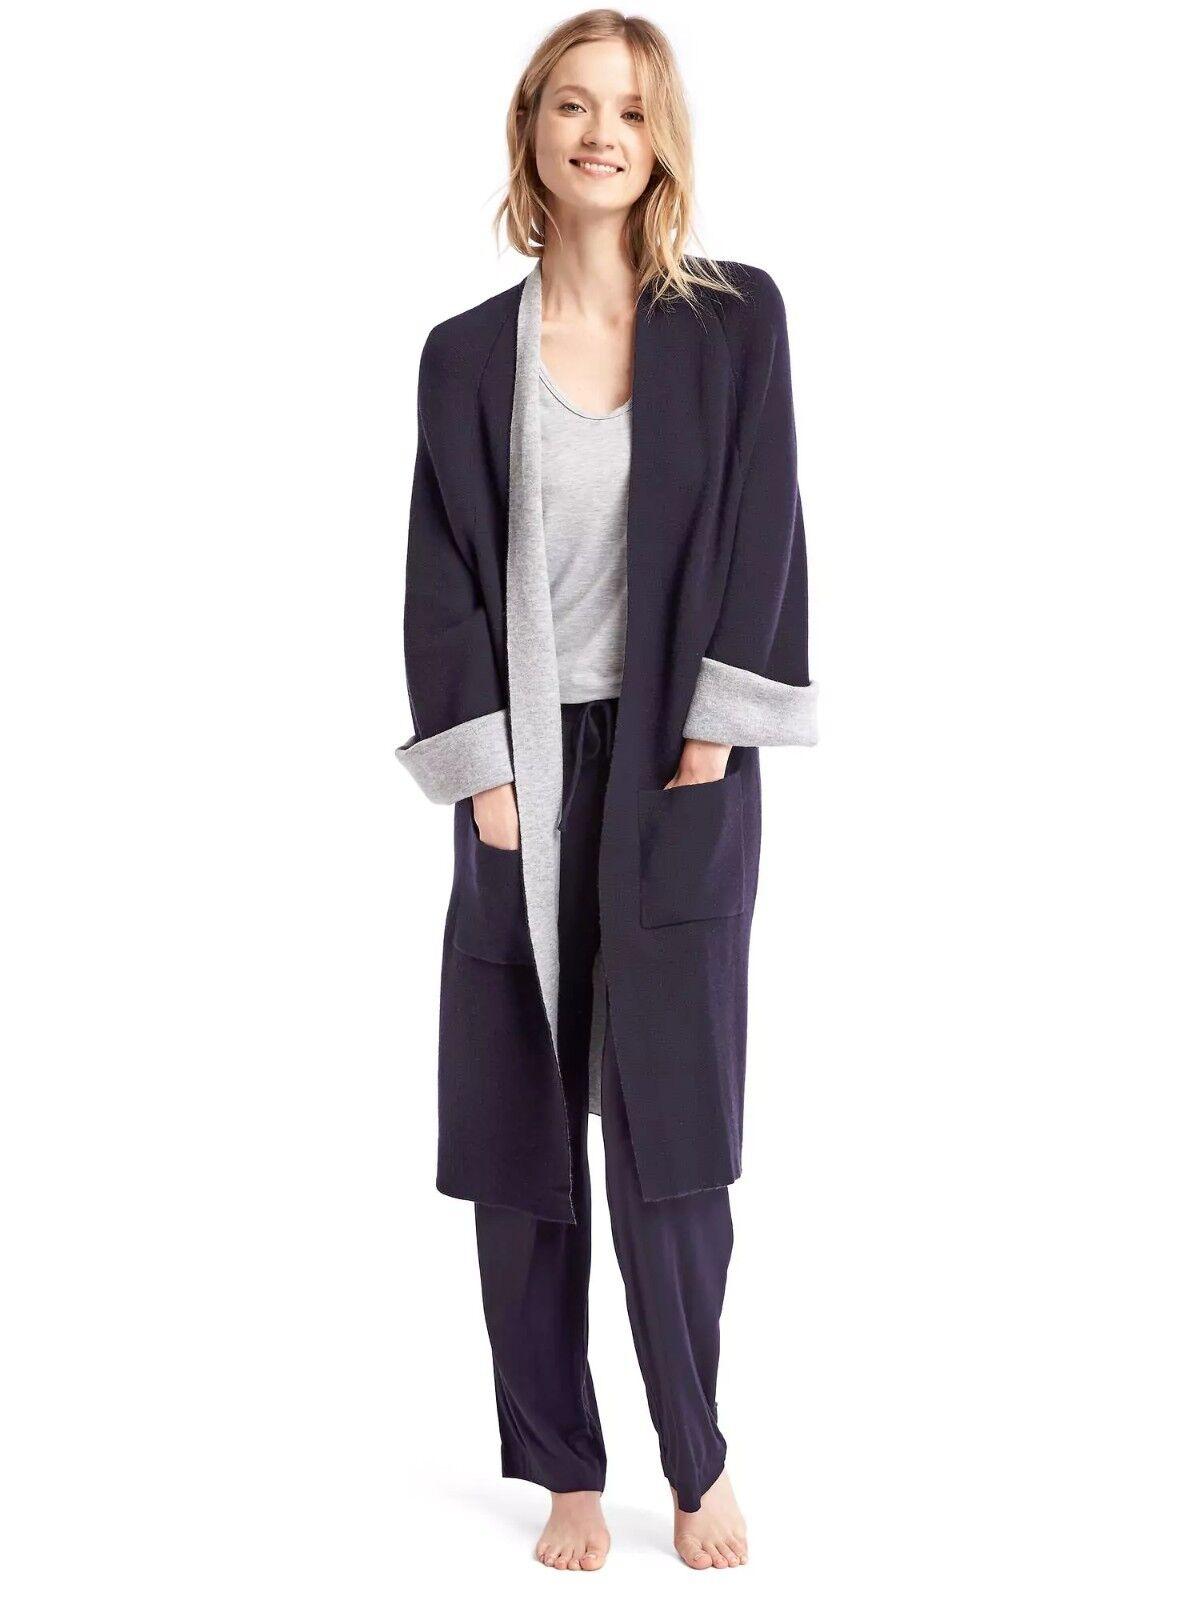 NWOT Gap Pure Body long cardigan, dark indigo SIZE M L     v